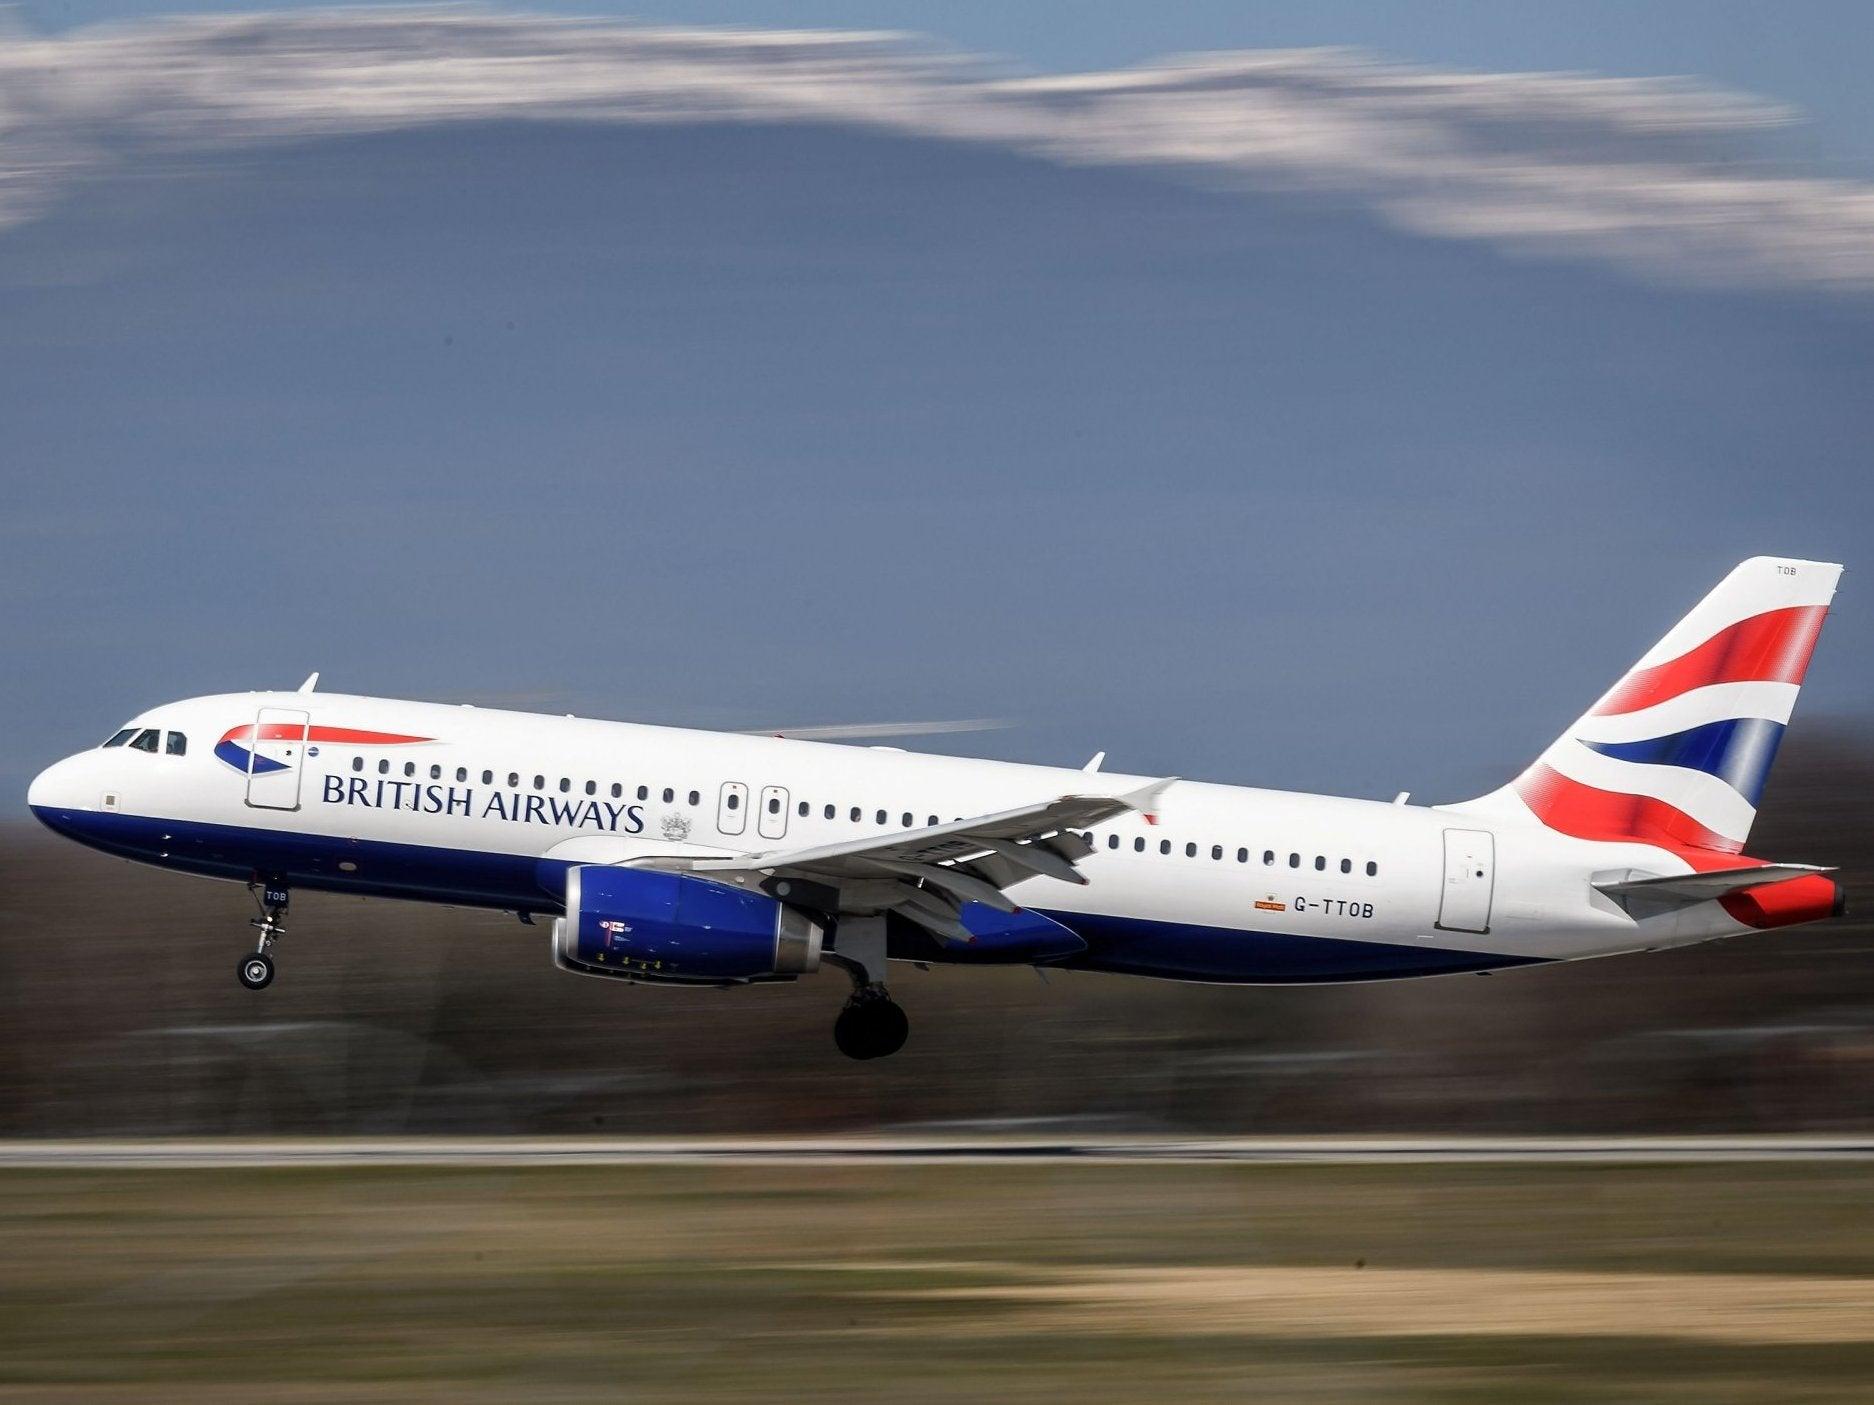 British Airways launches new compensation process